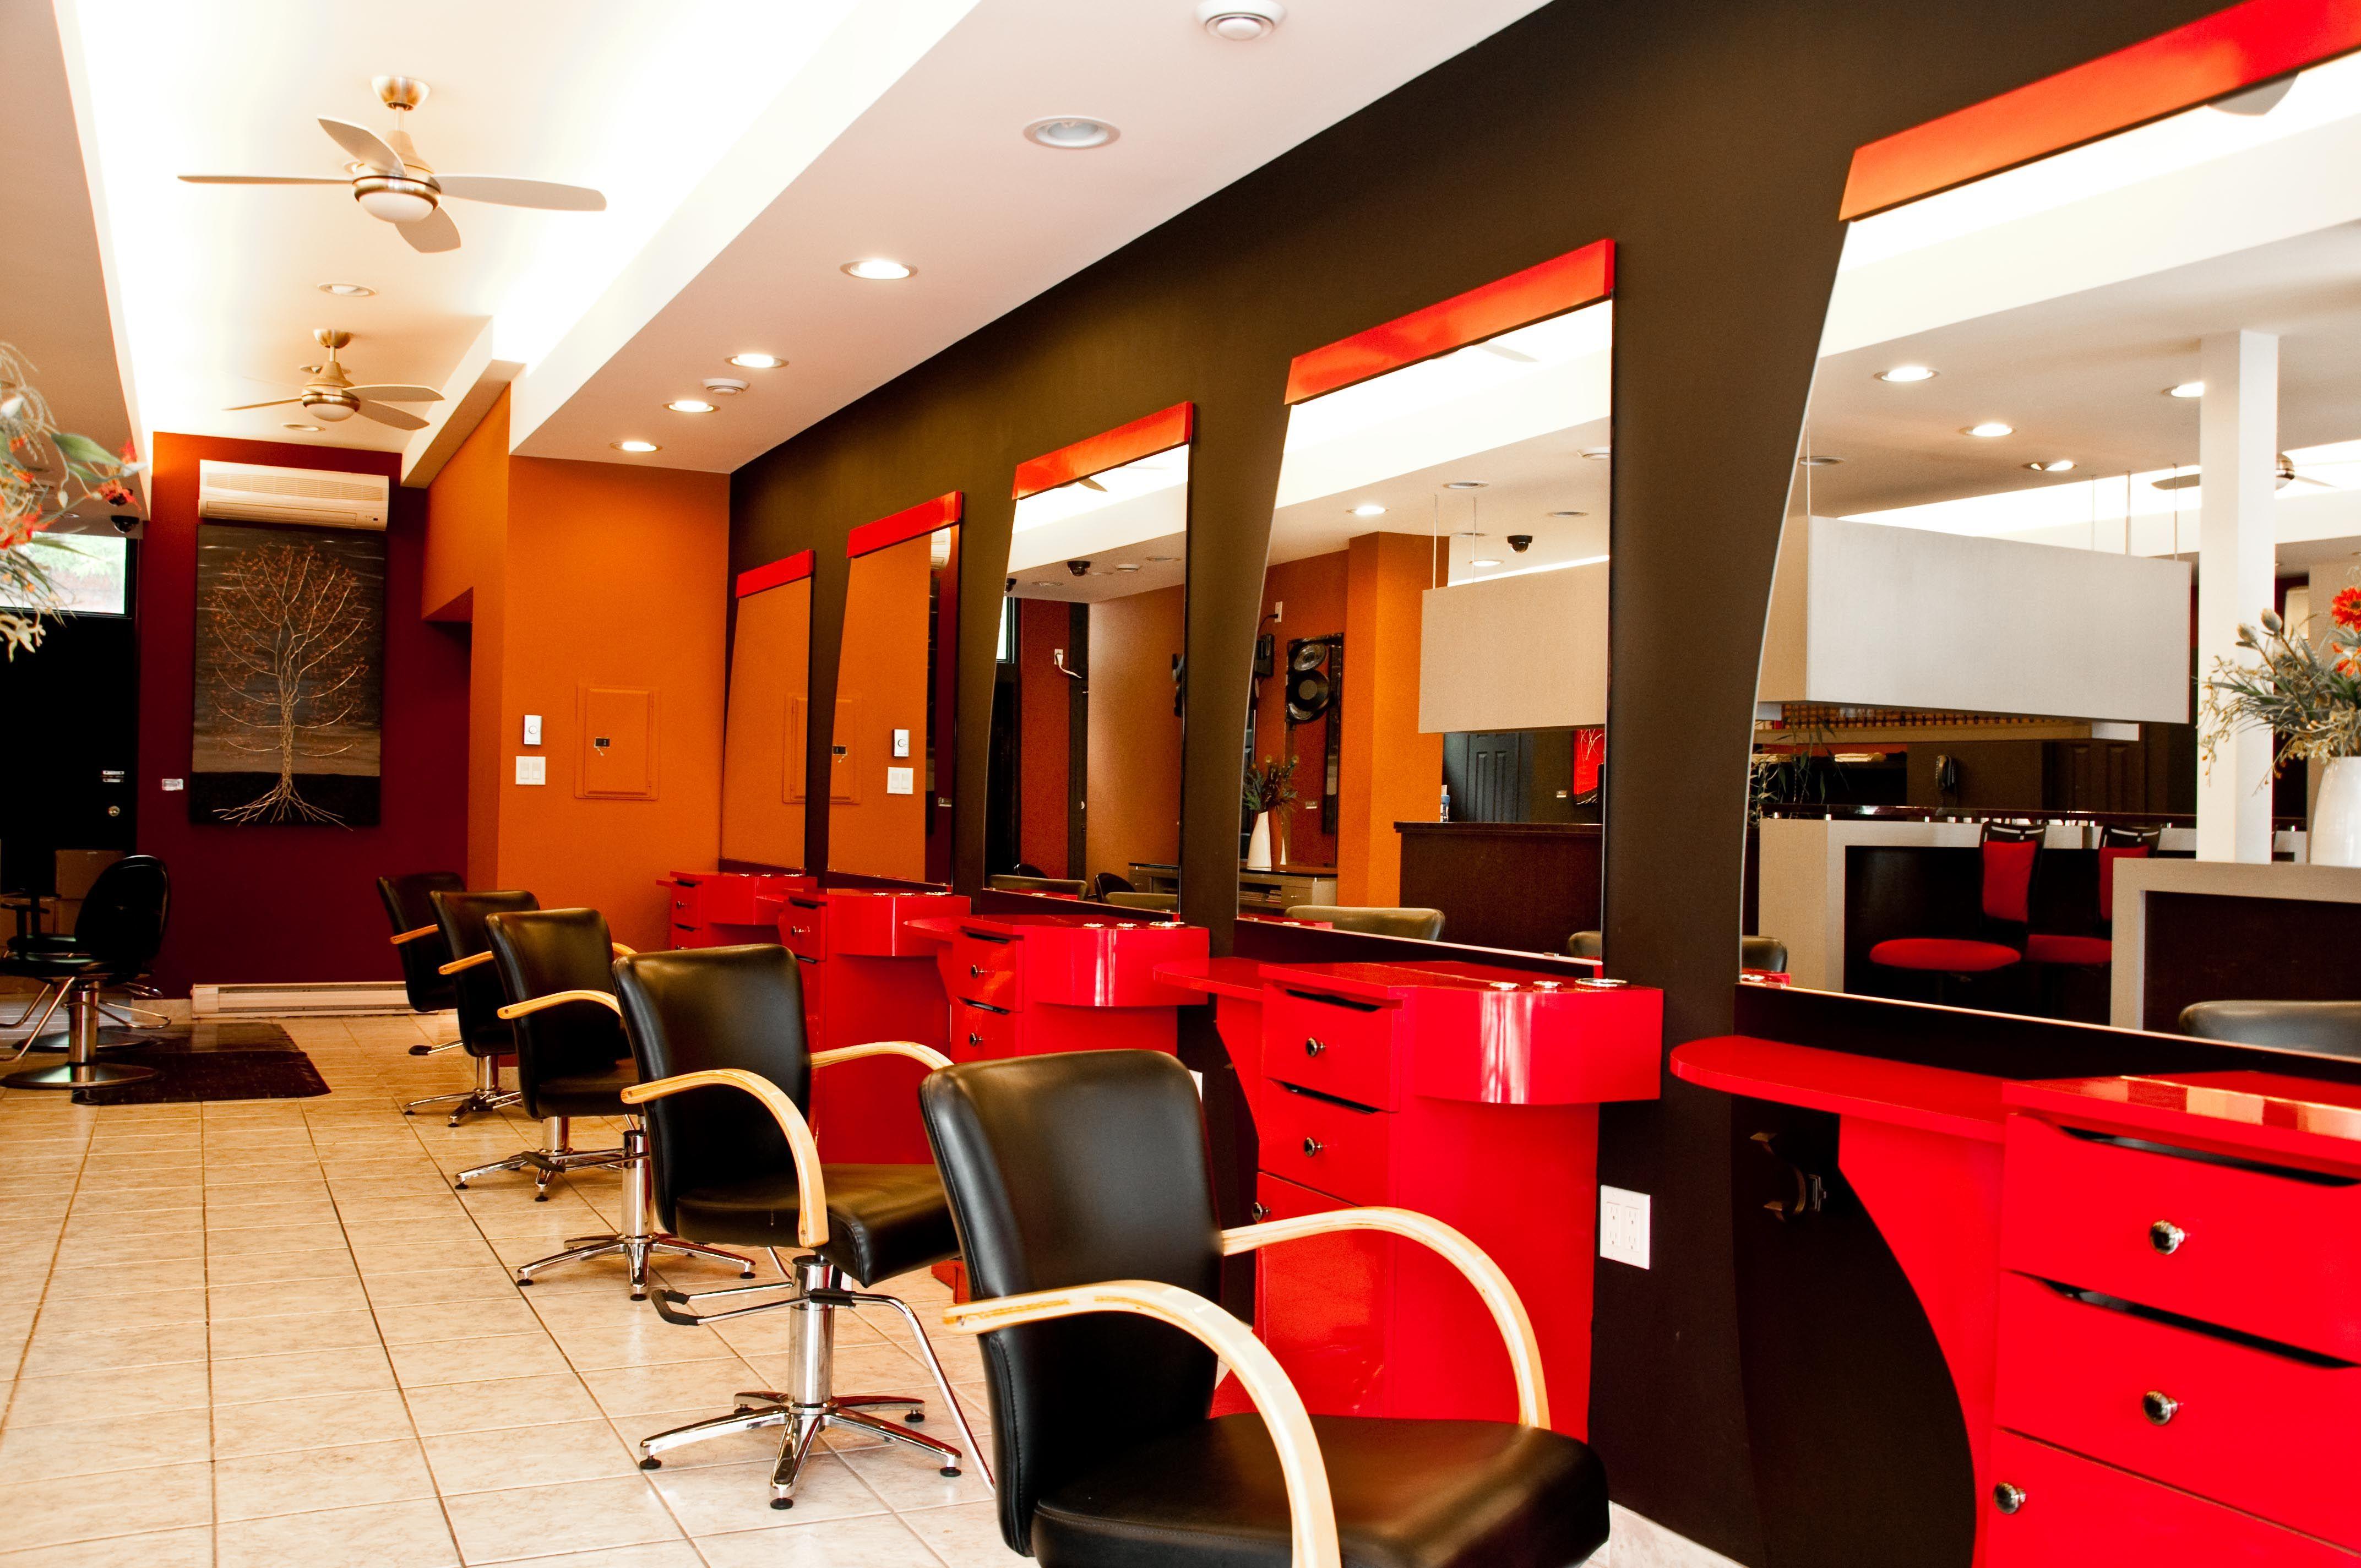 San Francisco Hair Salon Salon Interior Design Salon Interior Hair Salon Interior